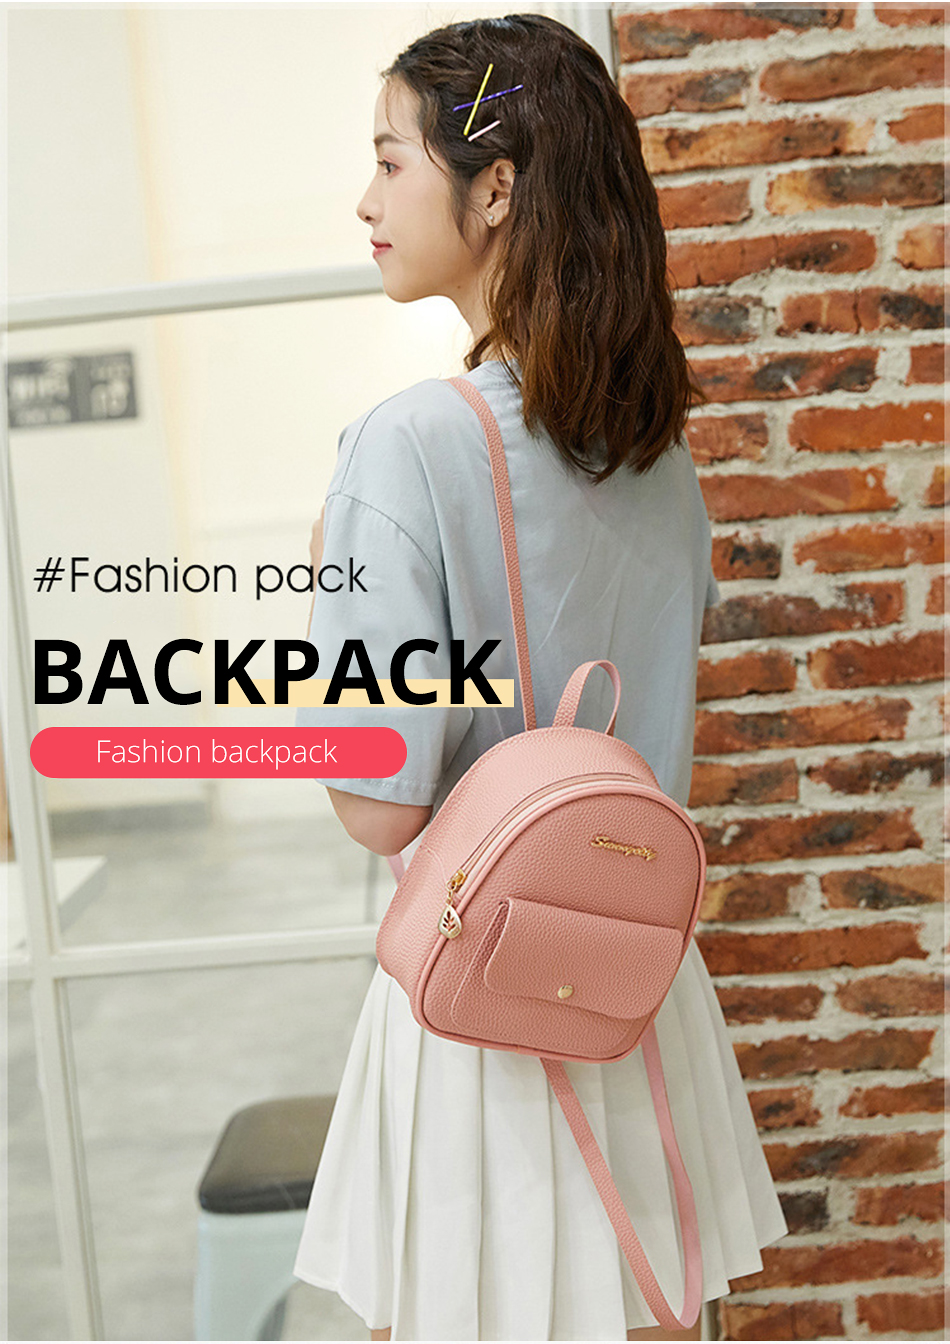 HTB1Hw7PXBKw3KVjSZTEq6AuRpXak 2019 Mini Backpack Women Korean Style PU Leather Shoulder Bag For Teenage Girls Multi-Function Small Bagpack Female Phone Pouch